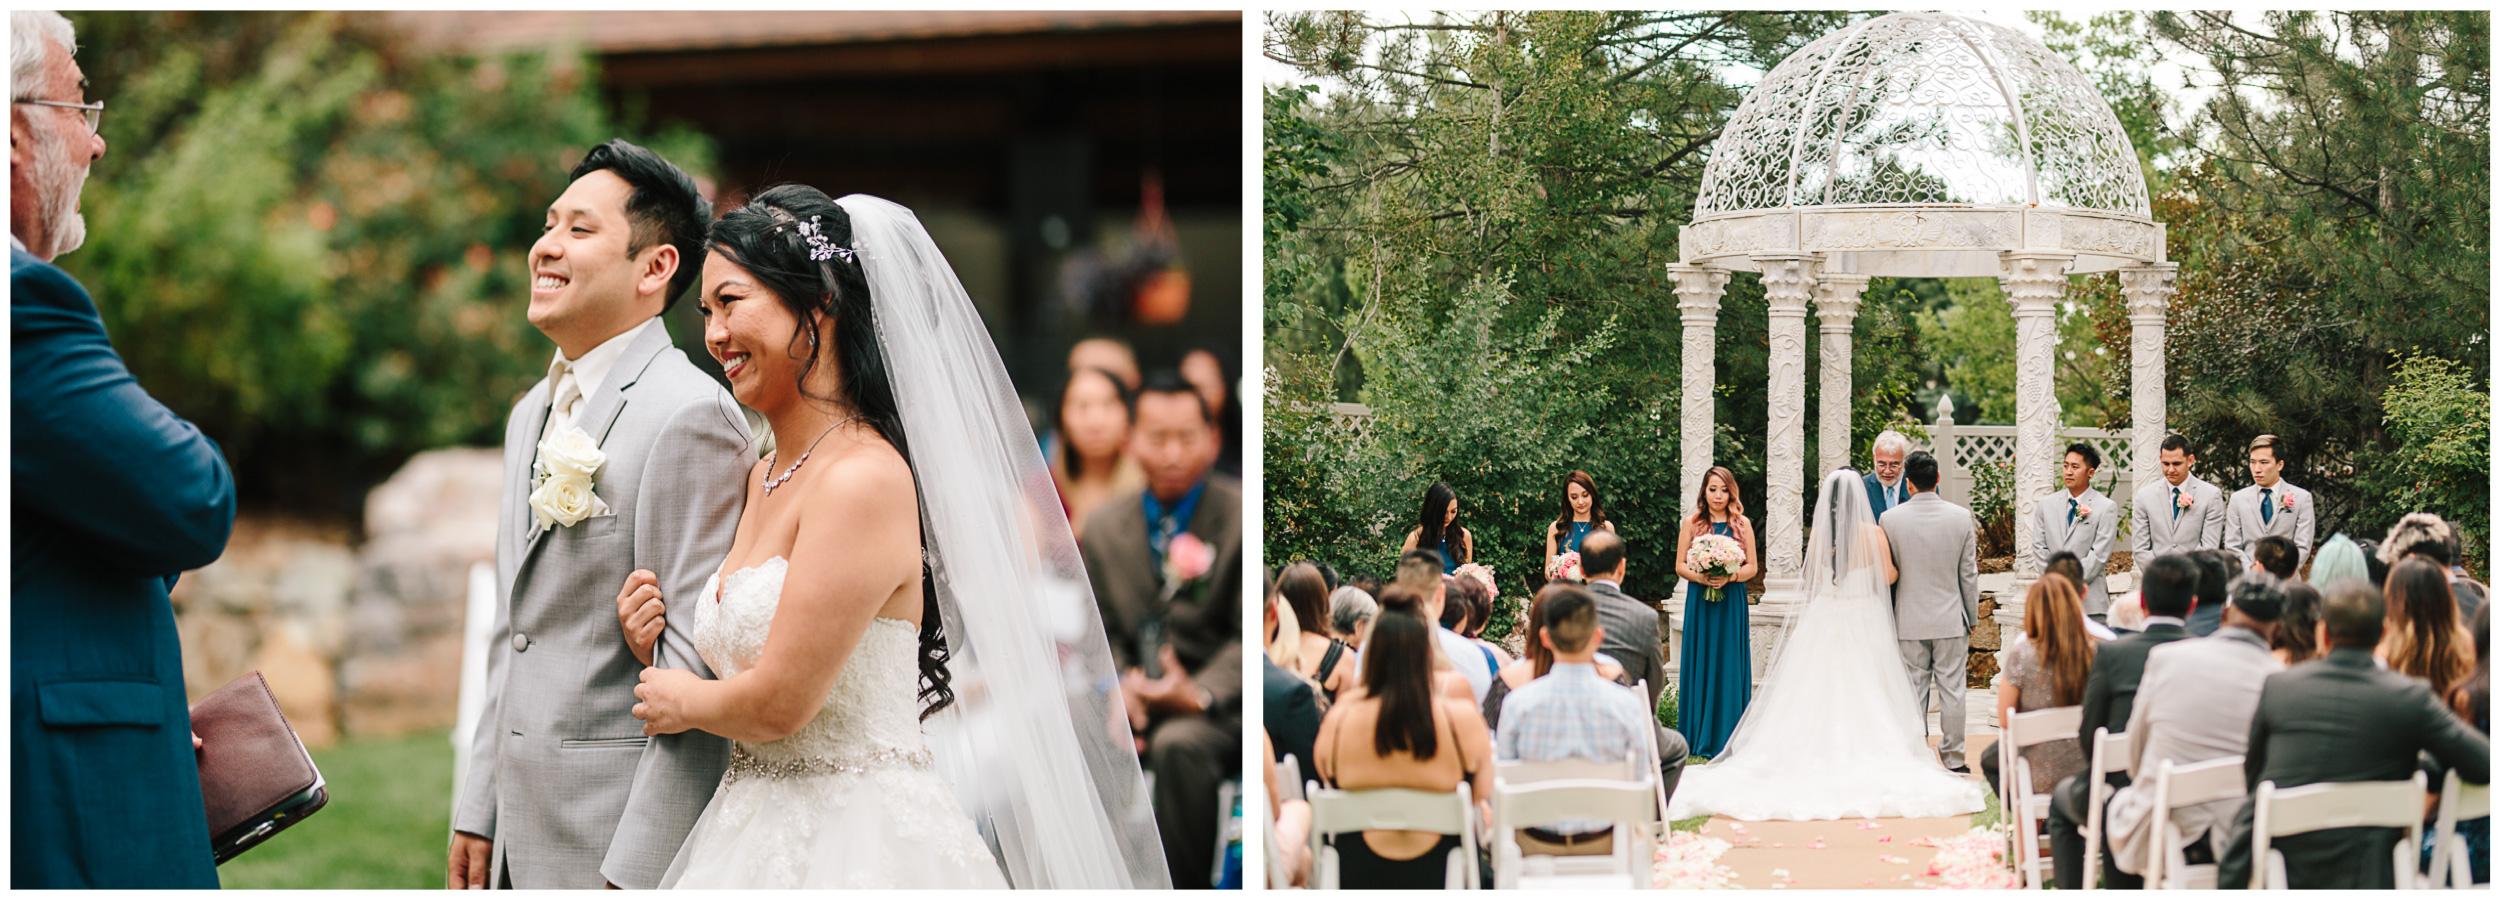 stonebrook_manor_wedding_38.jpg